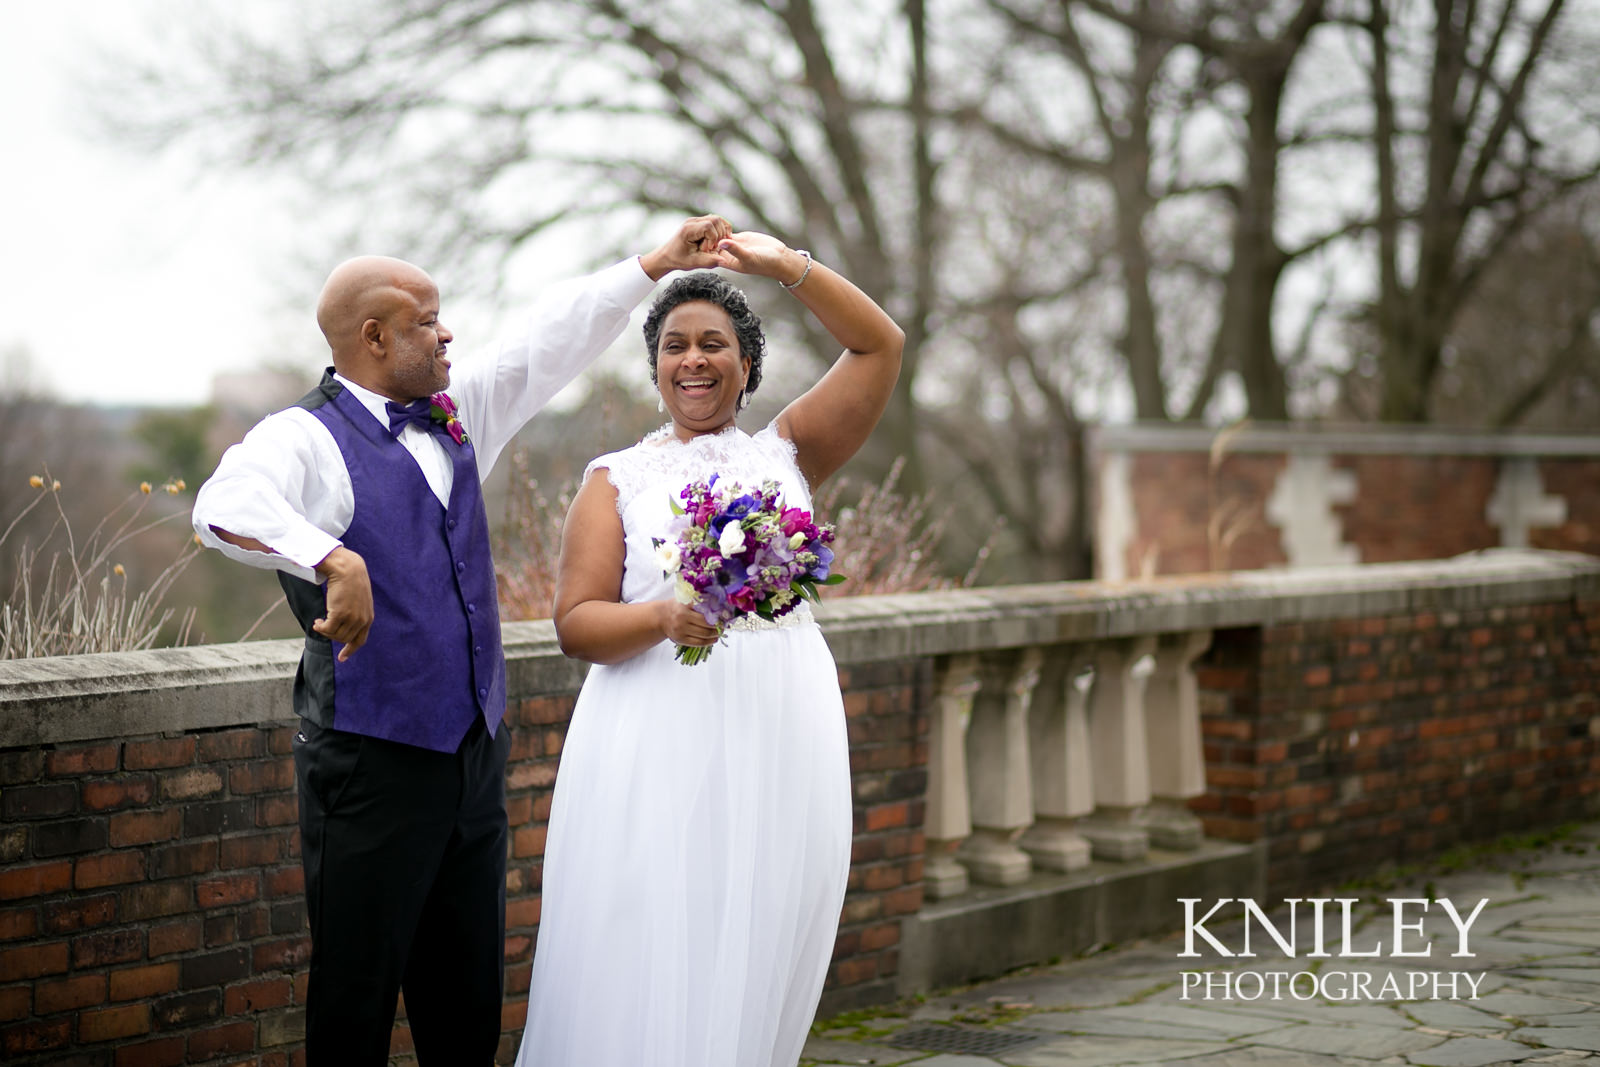 Rochester Colgate Divinity School Wedding - Classic Rochester NY Wedding - 030-IMG_5873.jpg